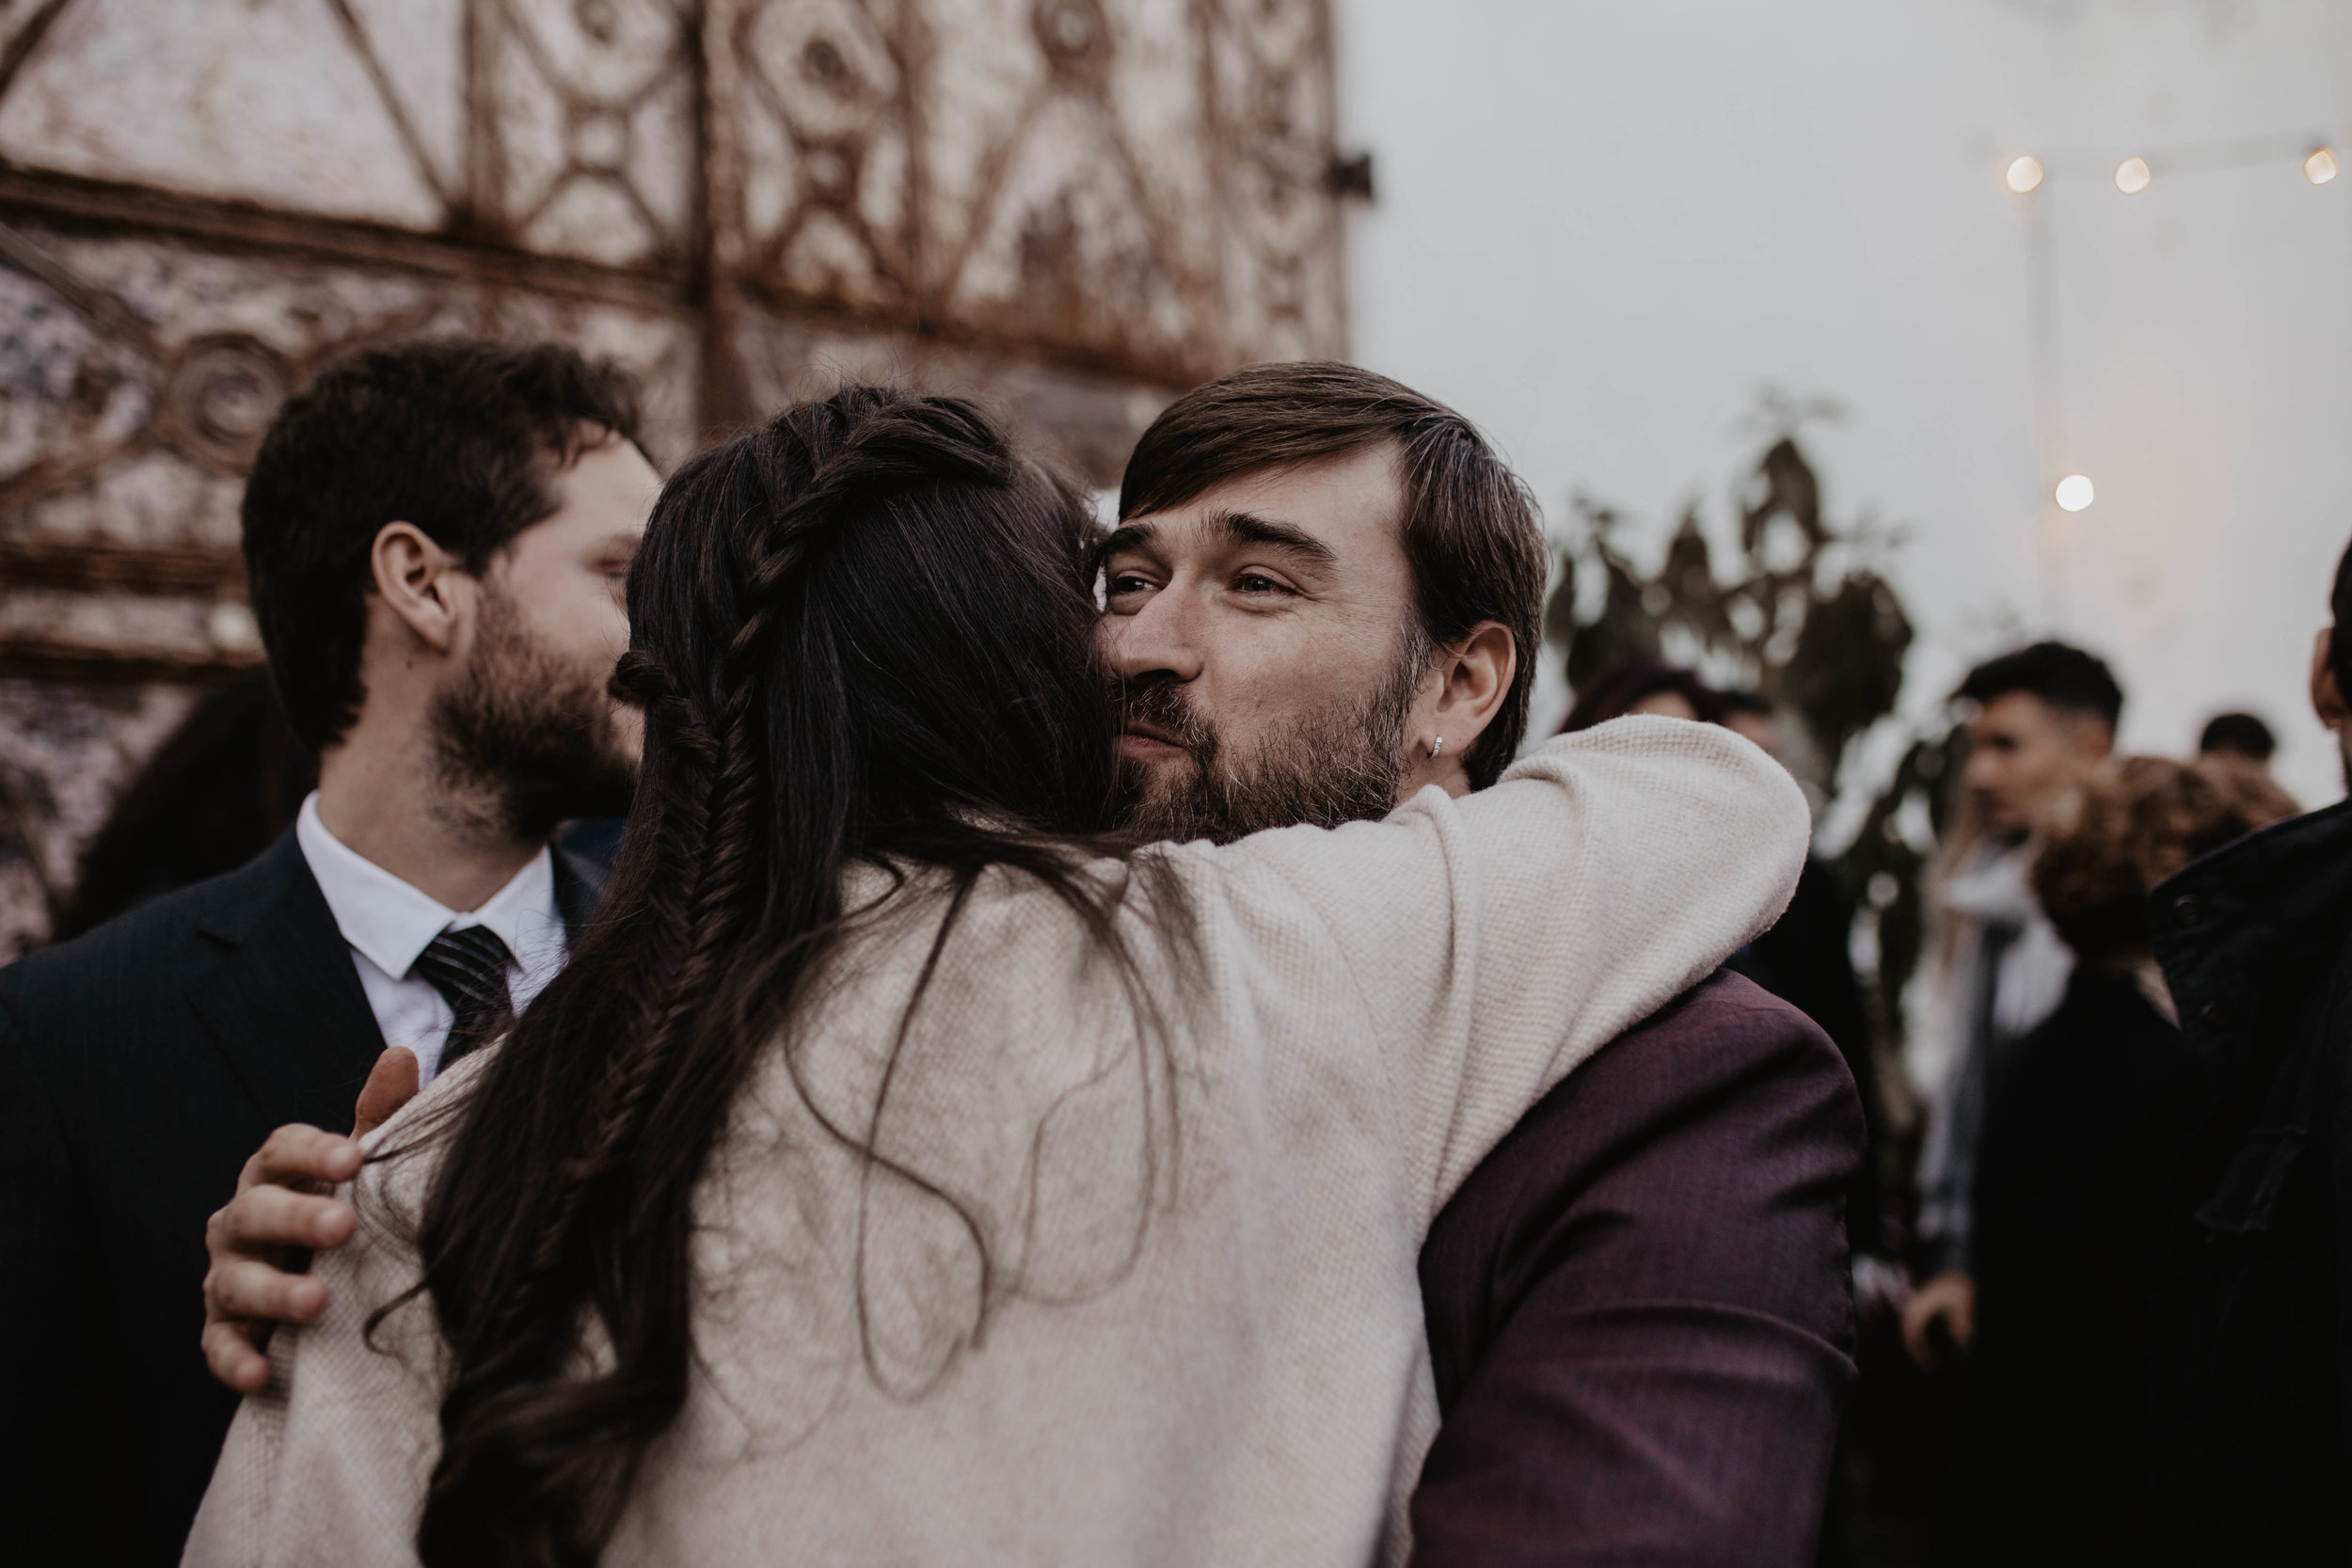 thenortherngirlphotography-photography-weddingphotography-couple-bodasconestilo-bodasenbarcelona-martadavid-672.jpg